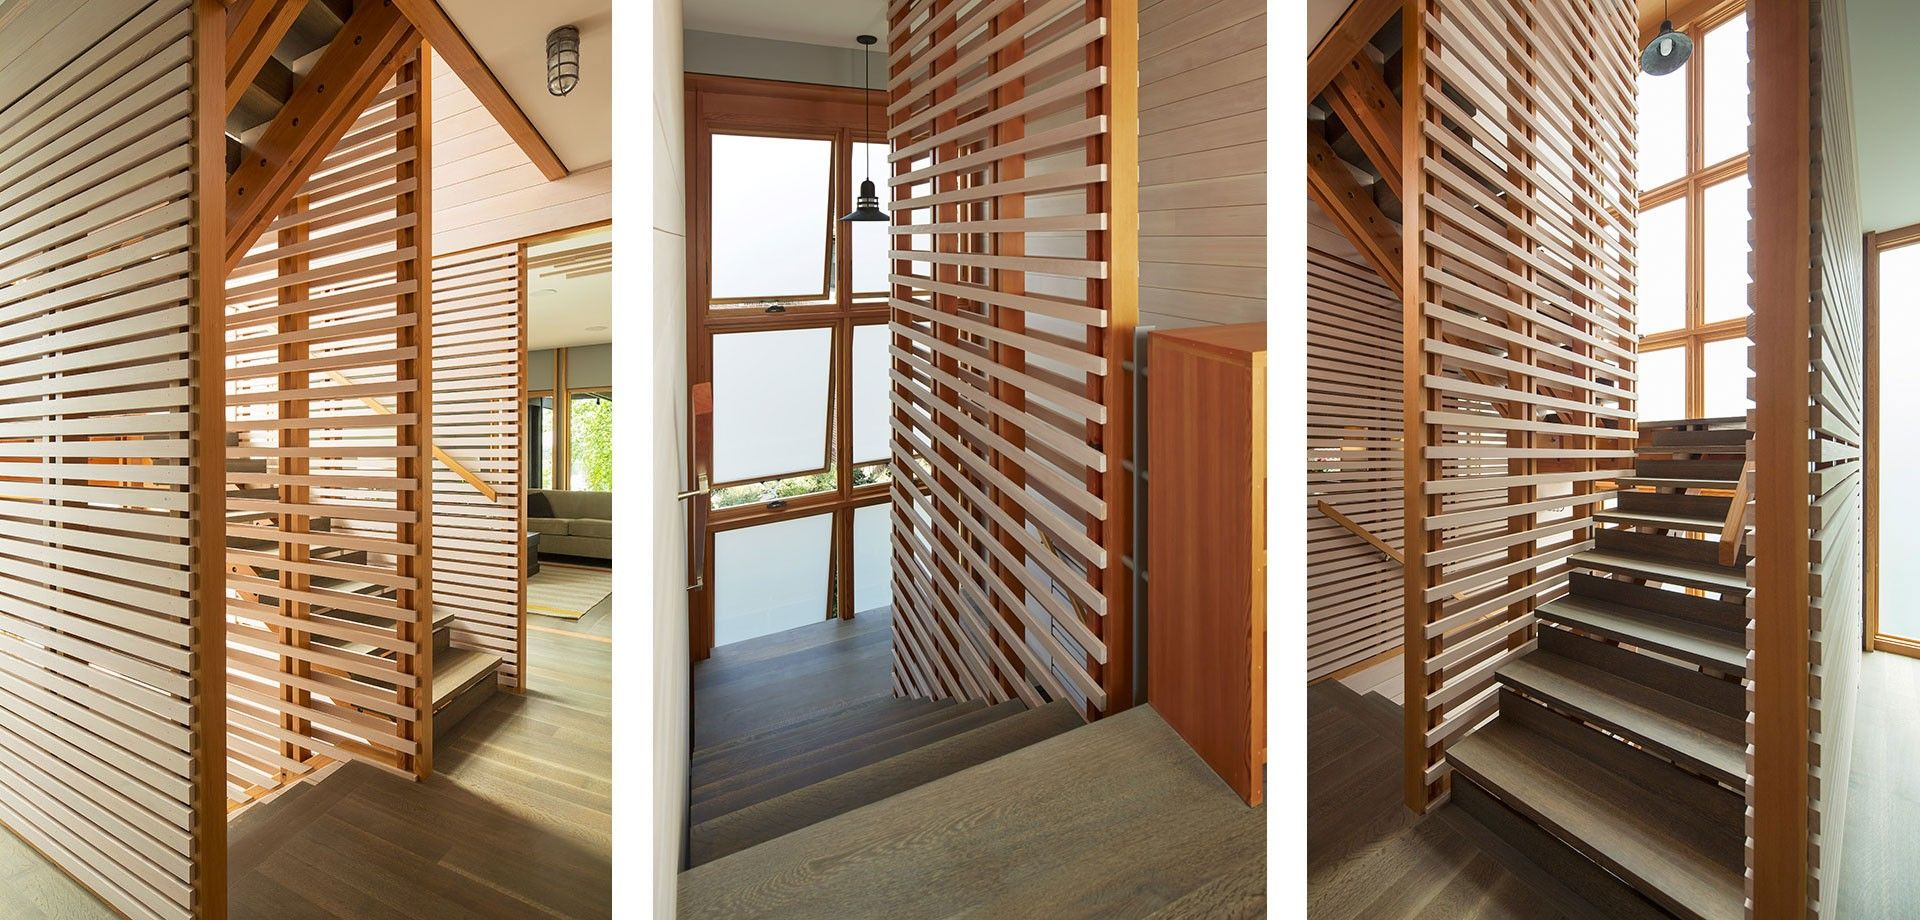 Isles | SALA Architects Inc.